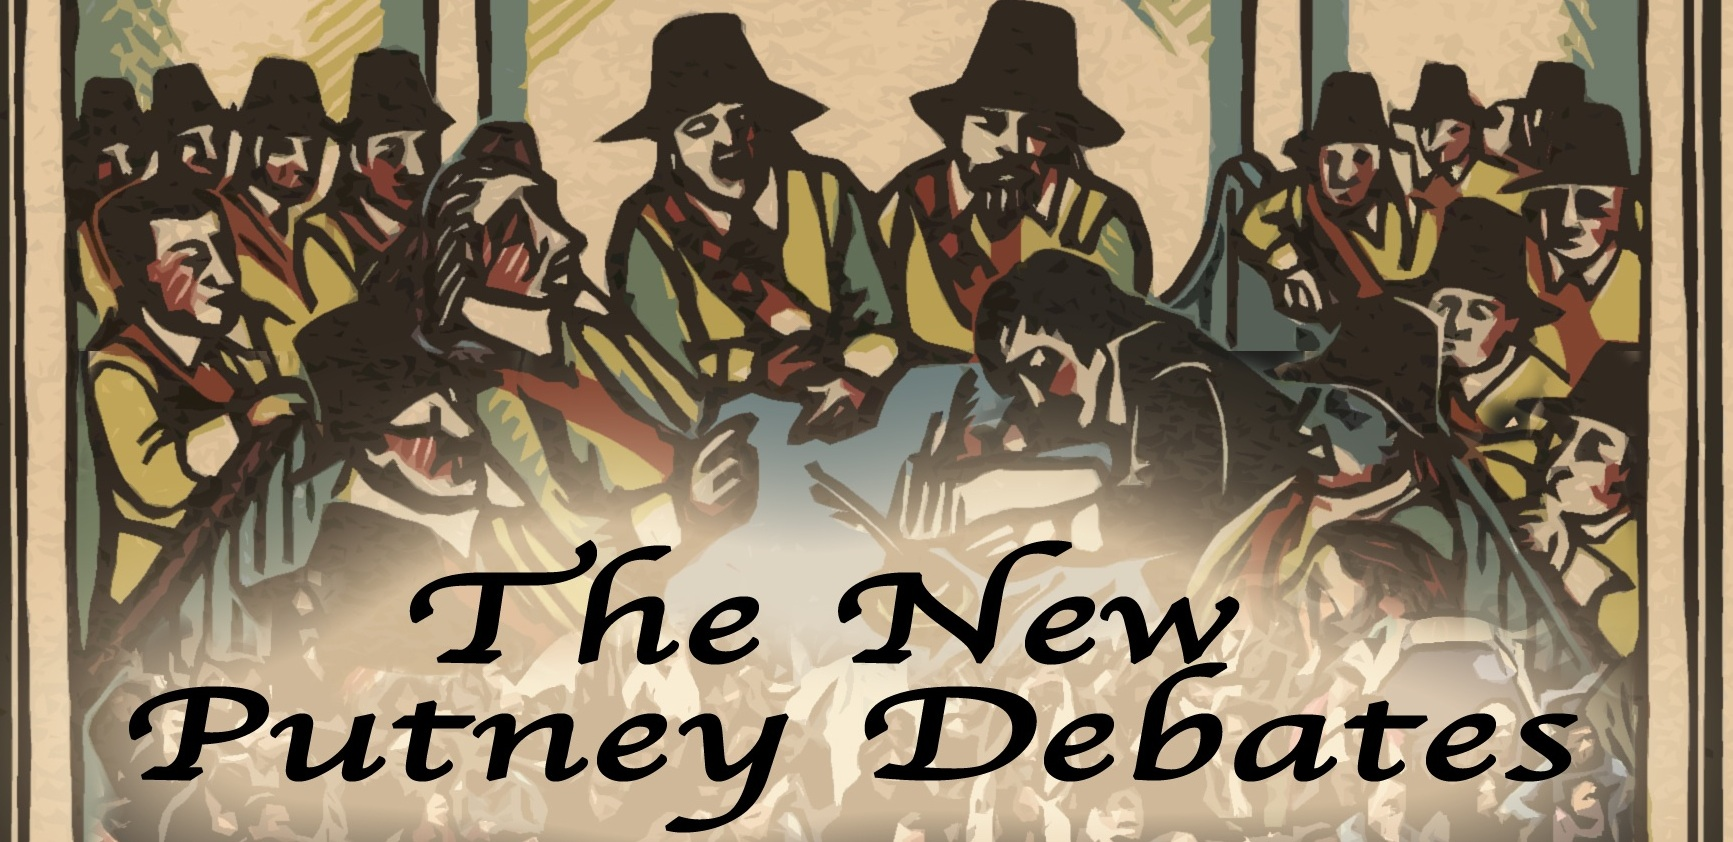 Putney Debates banner